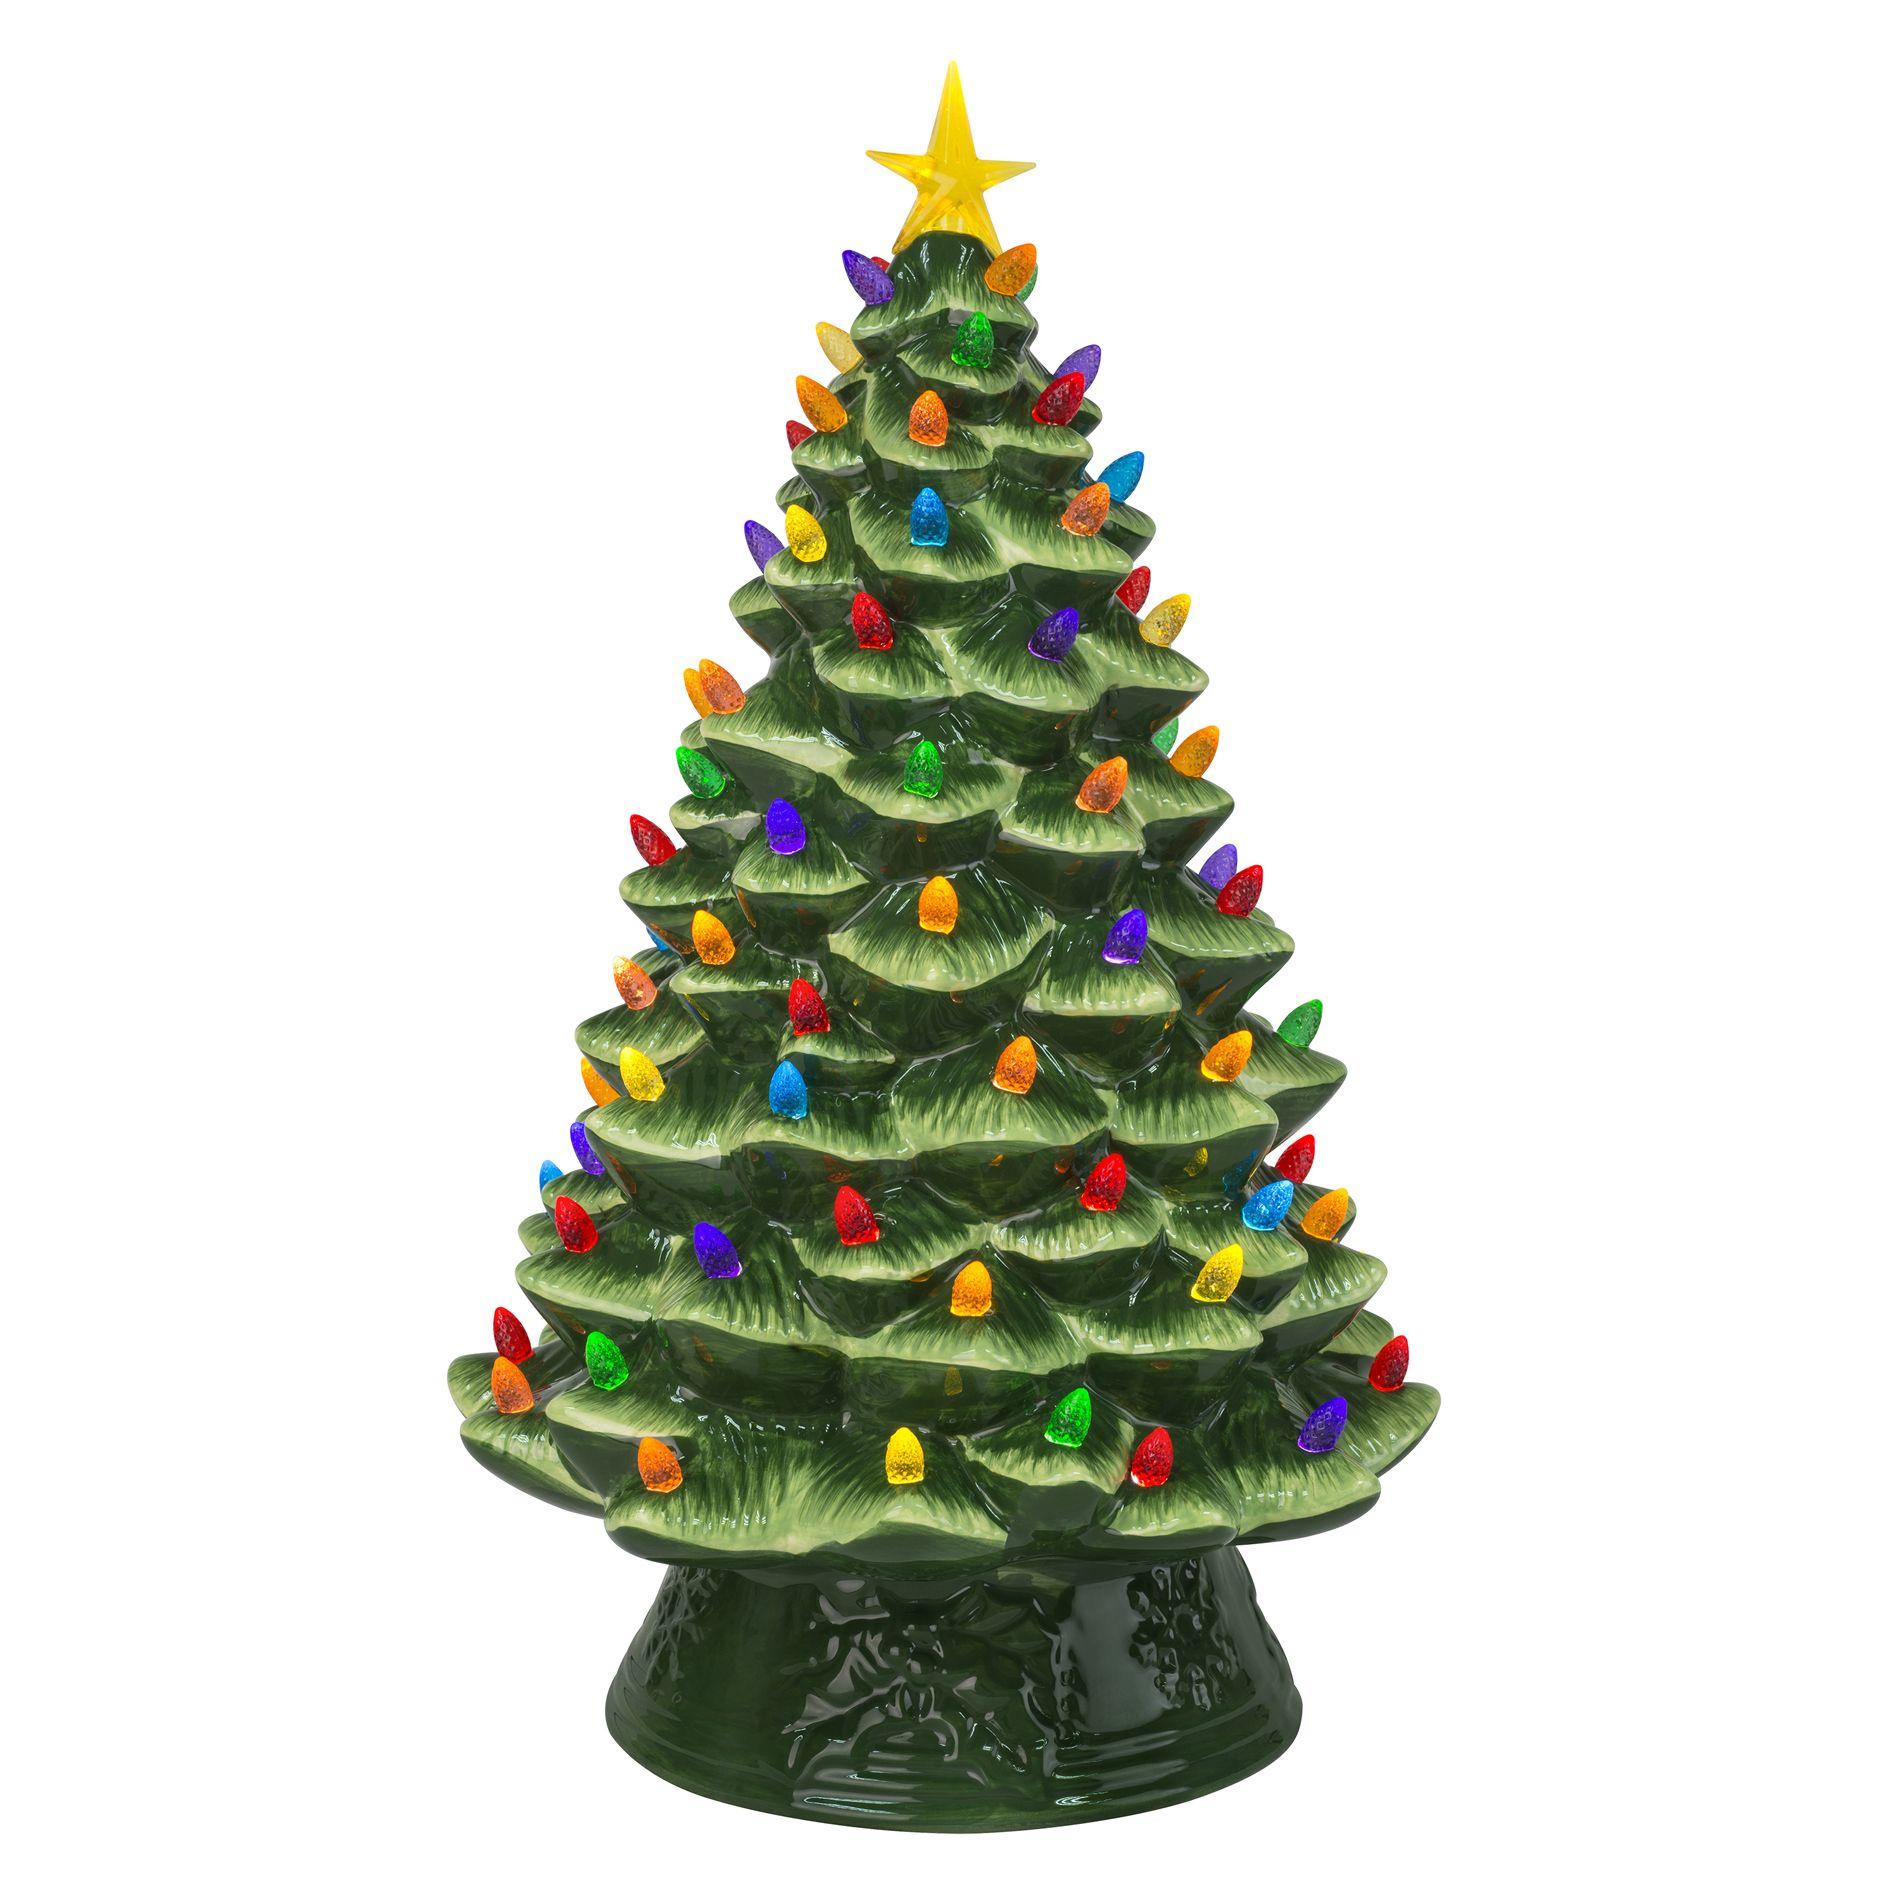 Mr Christmas 18 Nostalgic Tree Ceramic Christmas Trees Christmas Tree Bedding Tabletop Christmas Tree